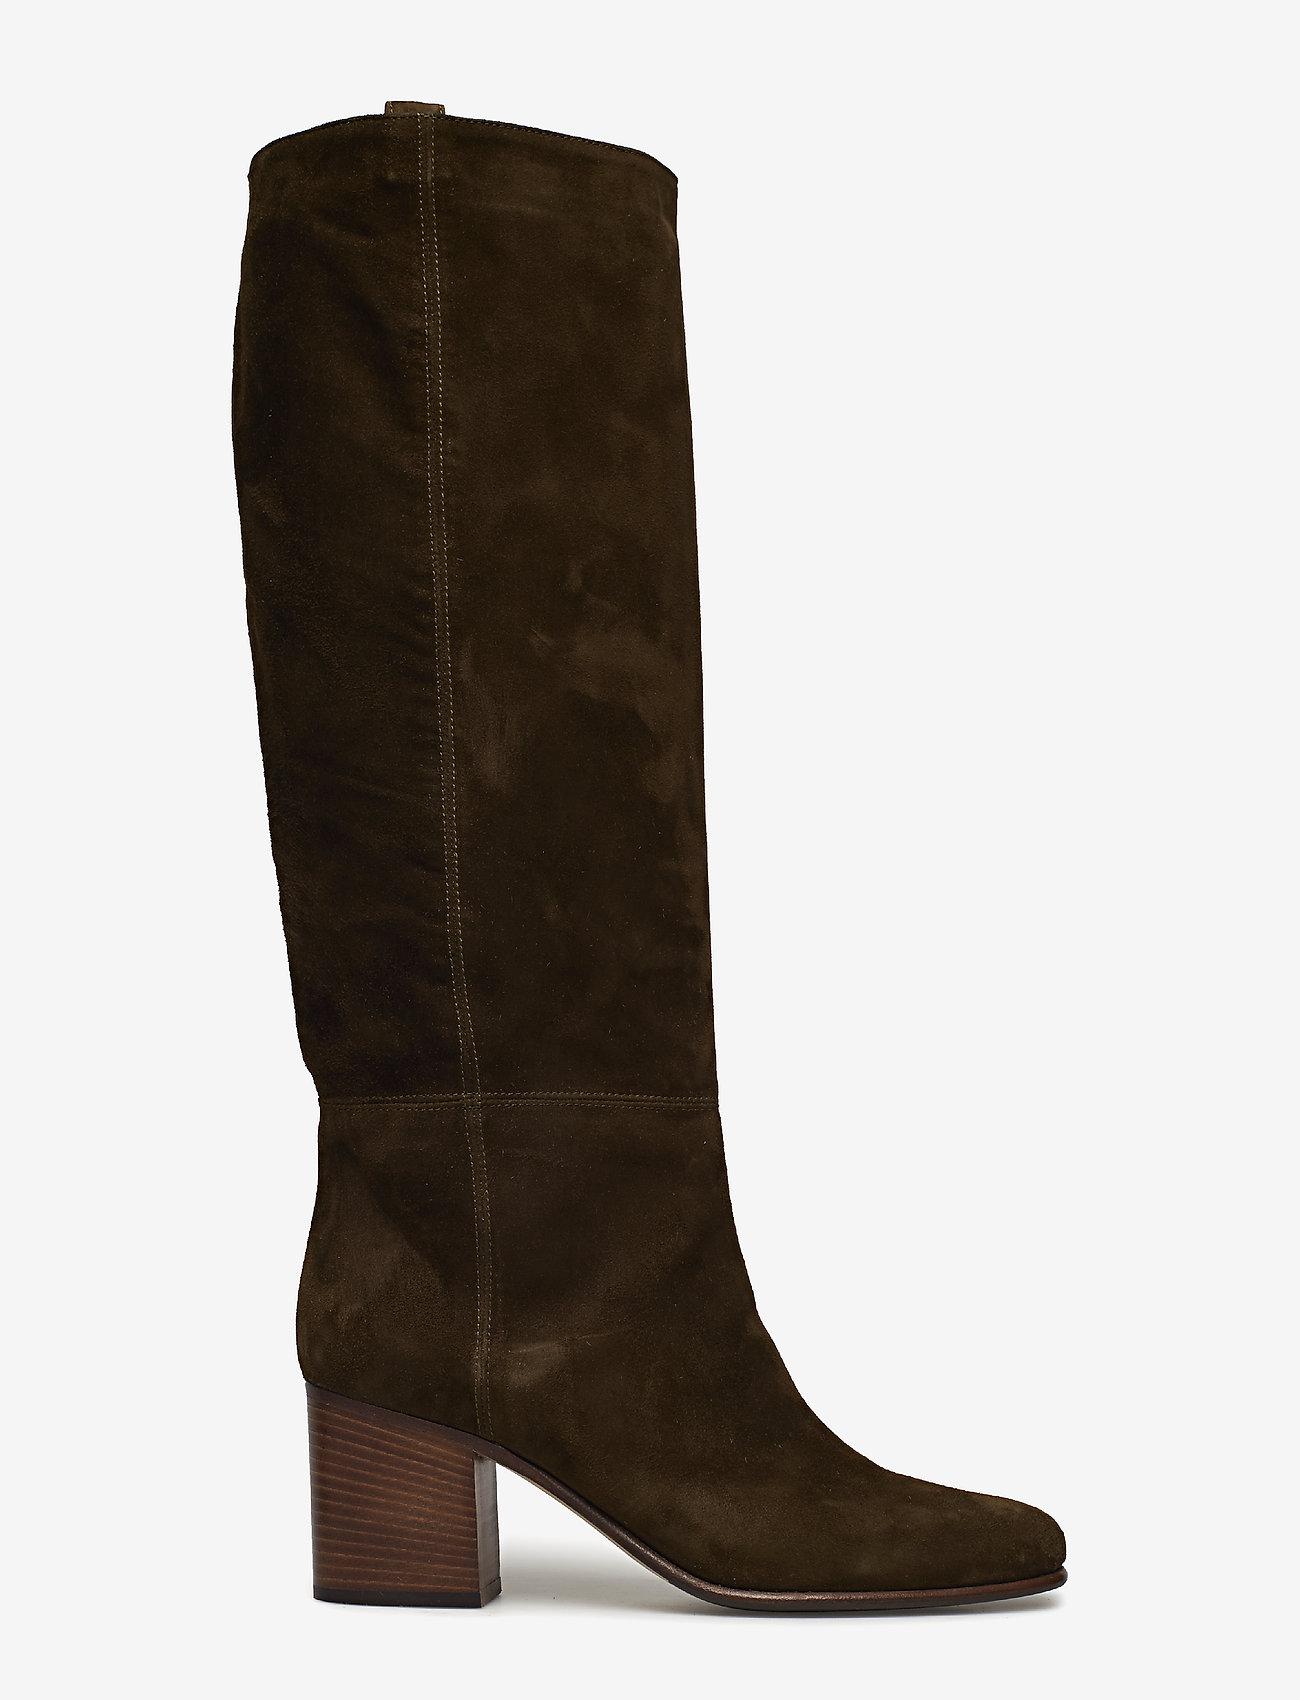 NOTABENE - Samara - høye boots - green suede - 1